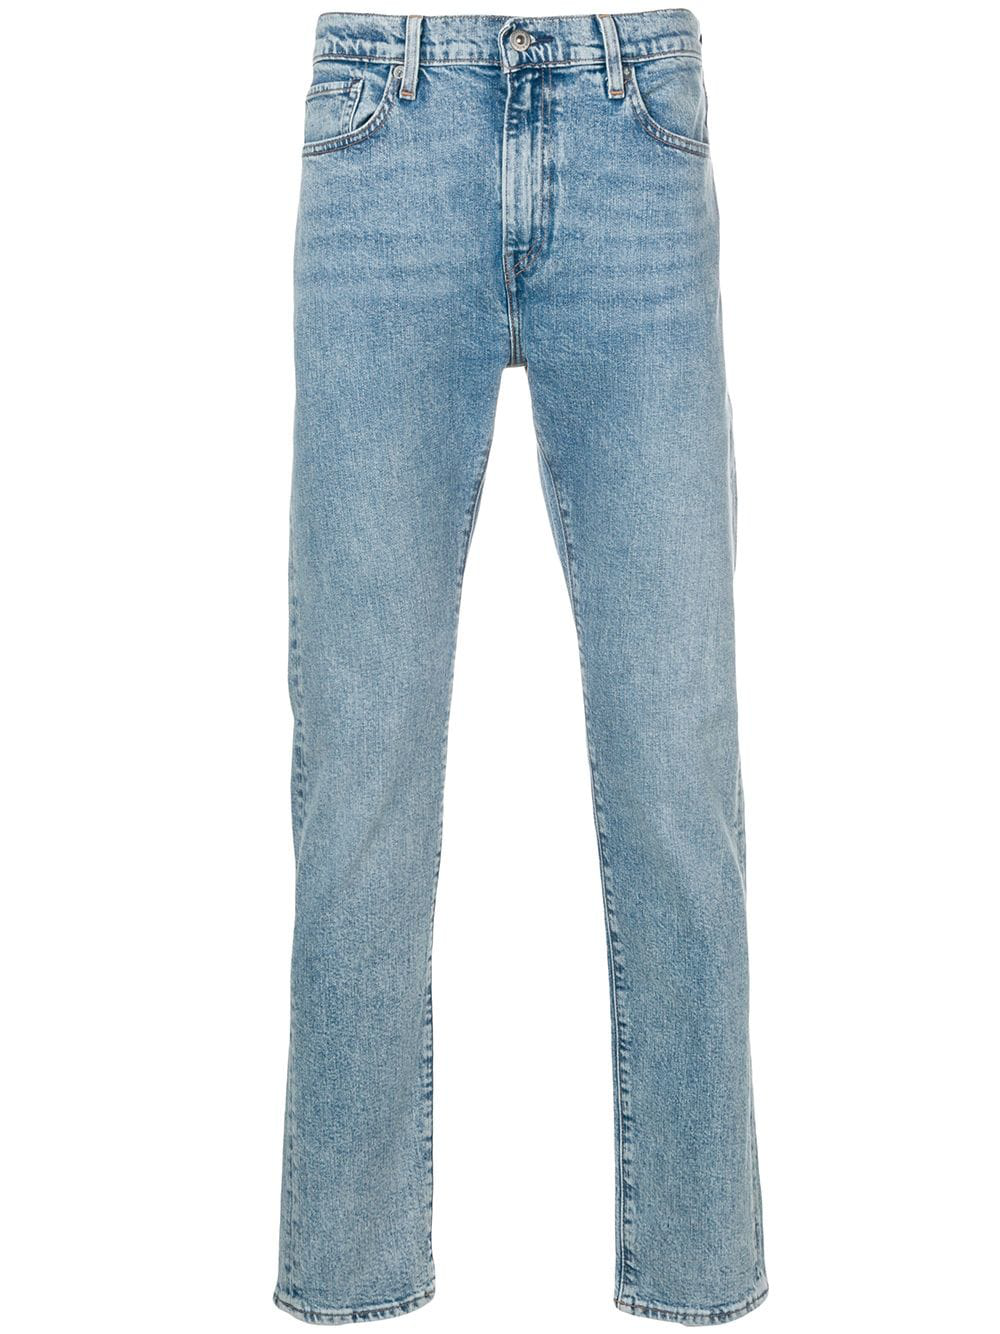 6e6e43f8 Levi's : Made & Crafted 510 Skinny-Fit Jeans - Blue | ModeSens